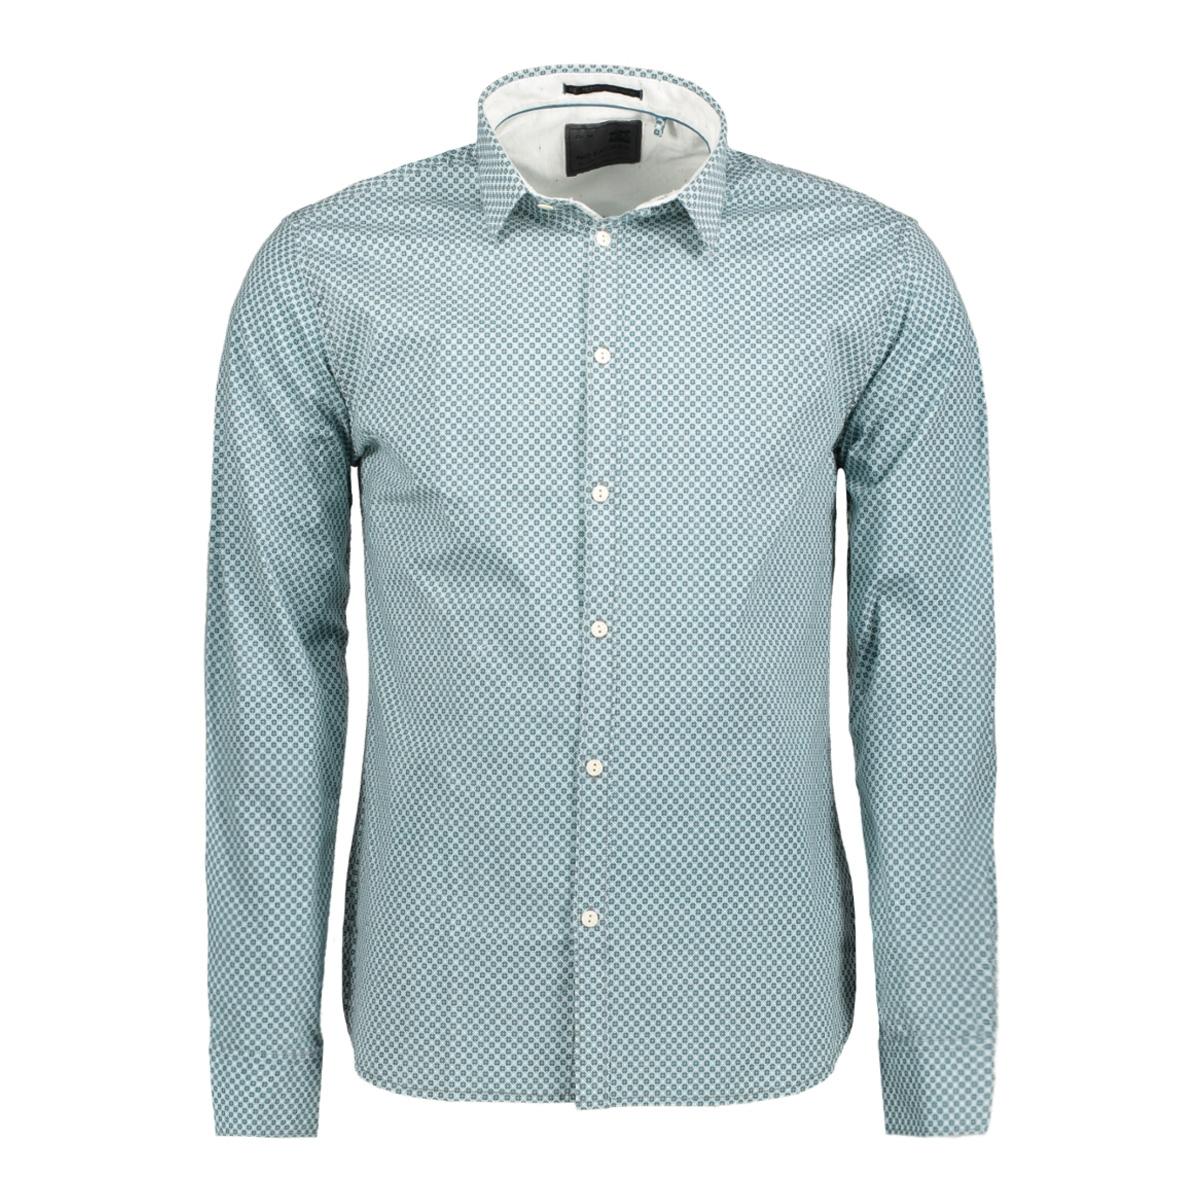 84481106 no-excess overhemd 133 arctic blue